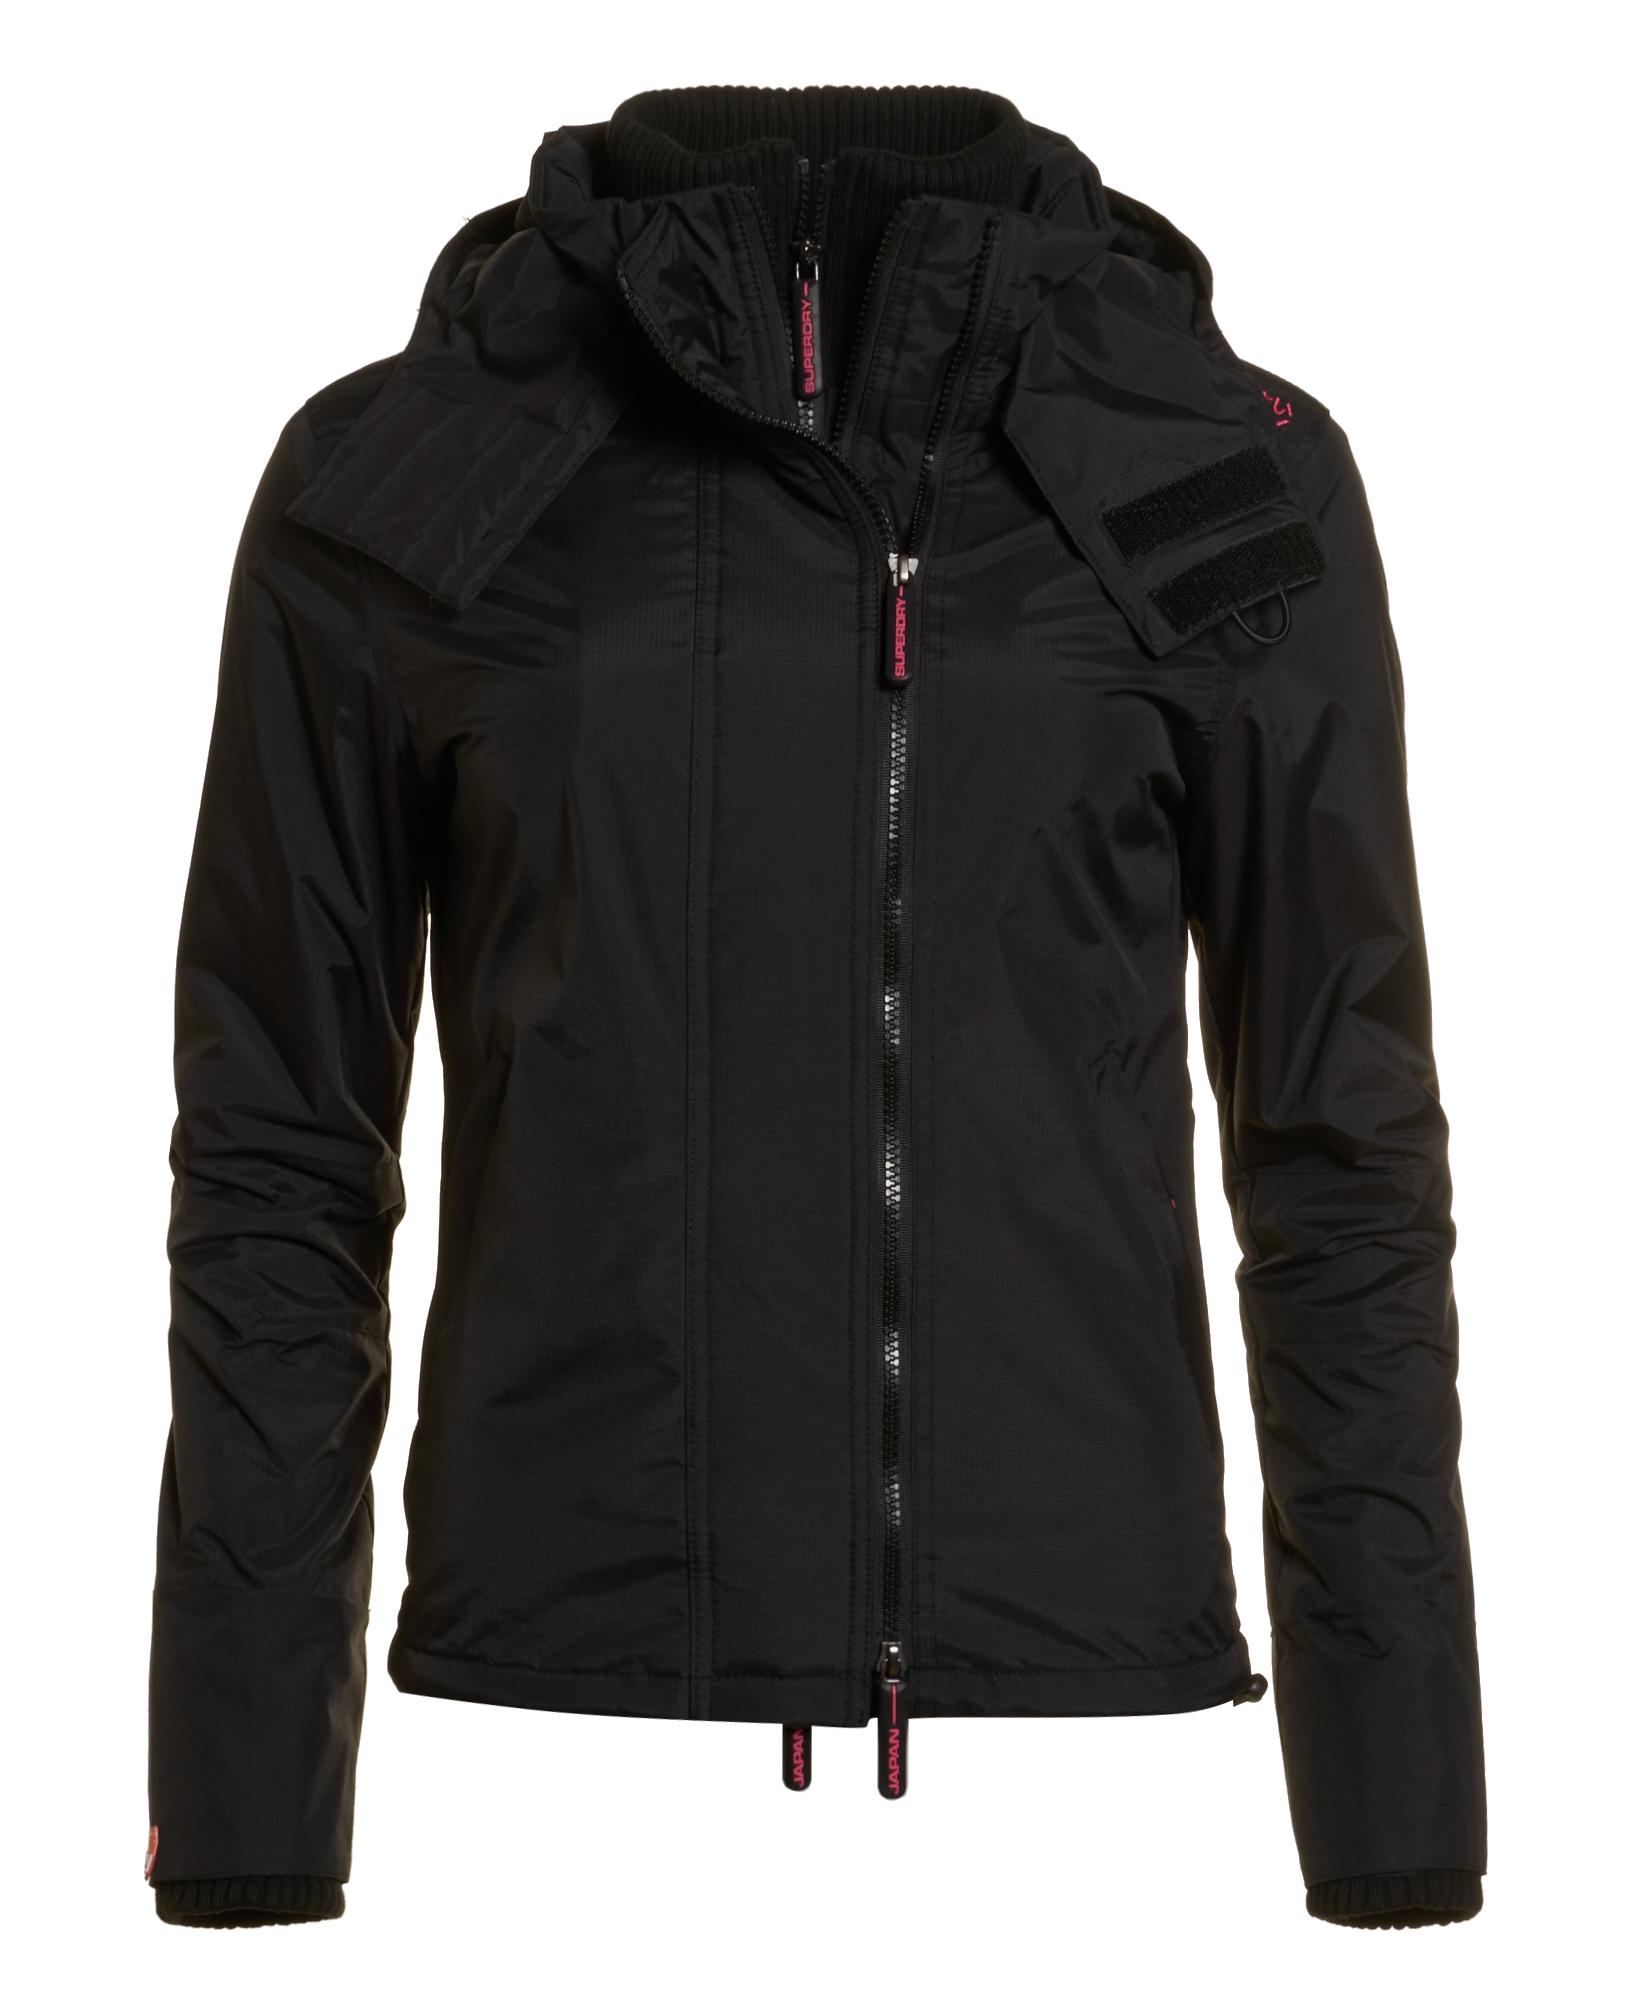 Superdry womens jacket sale